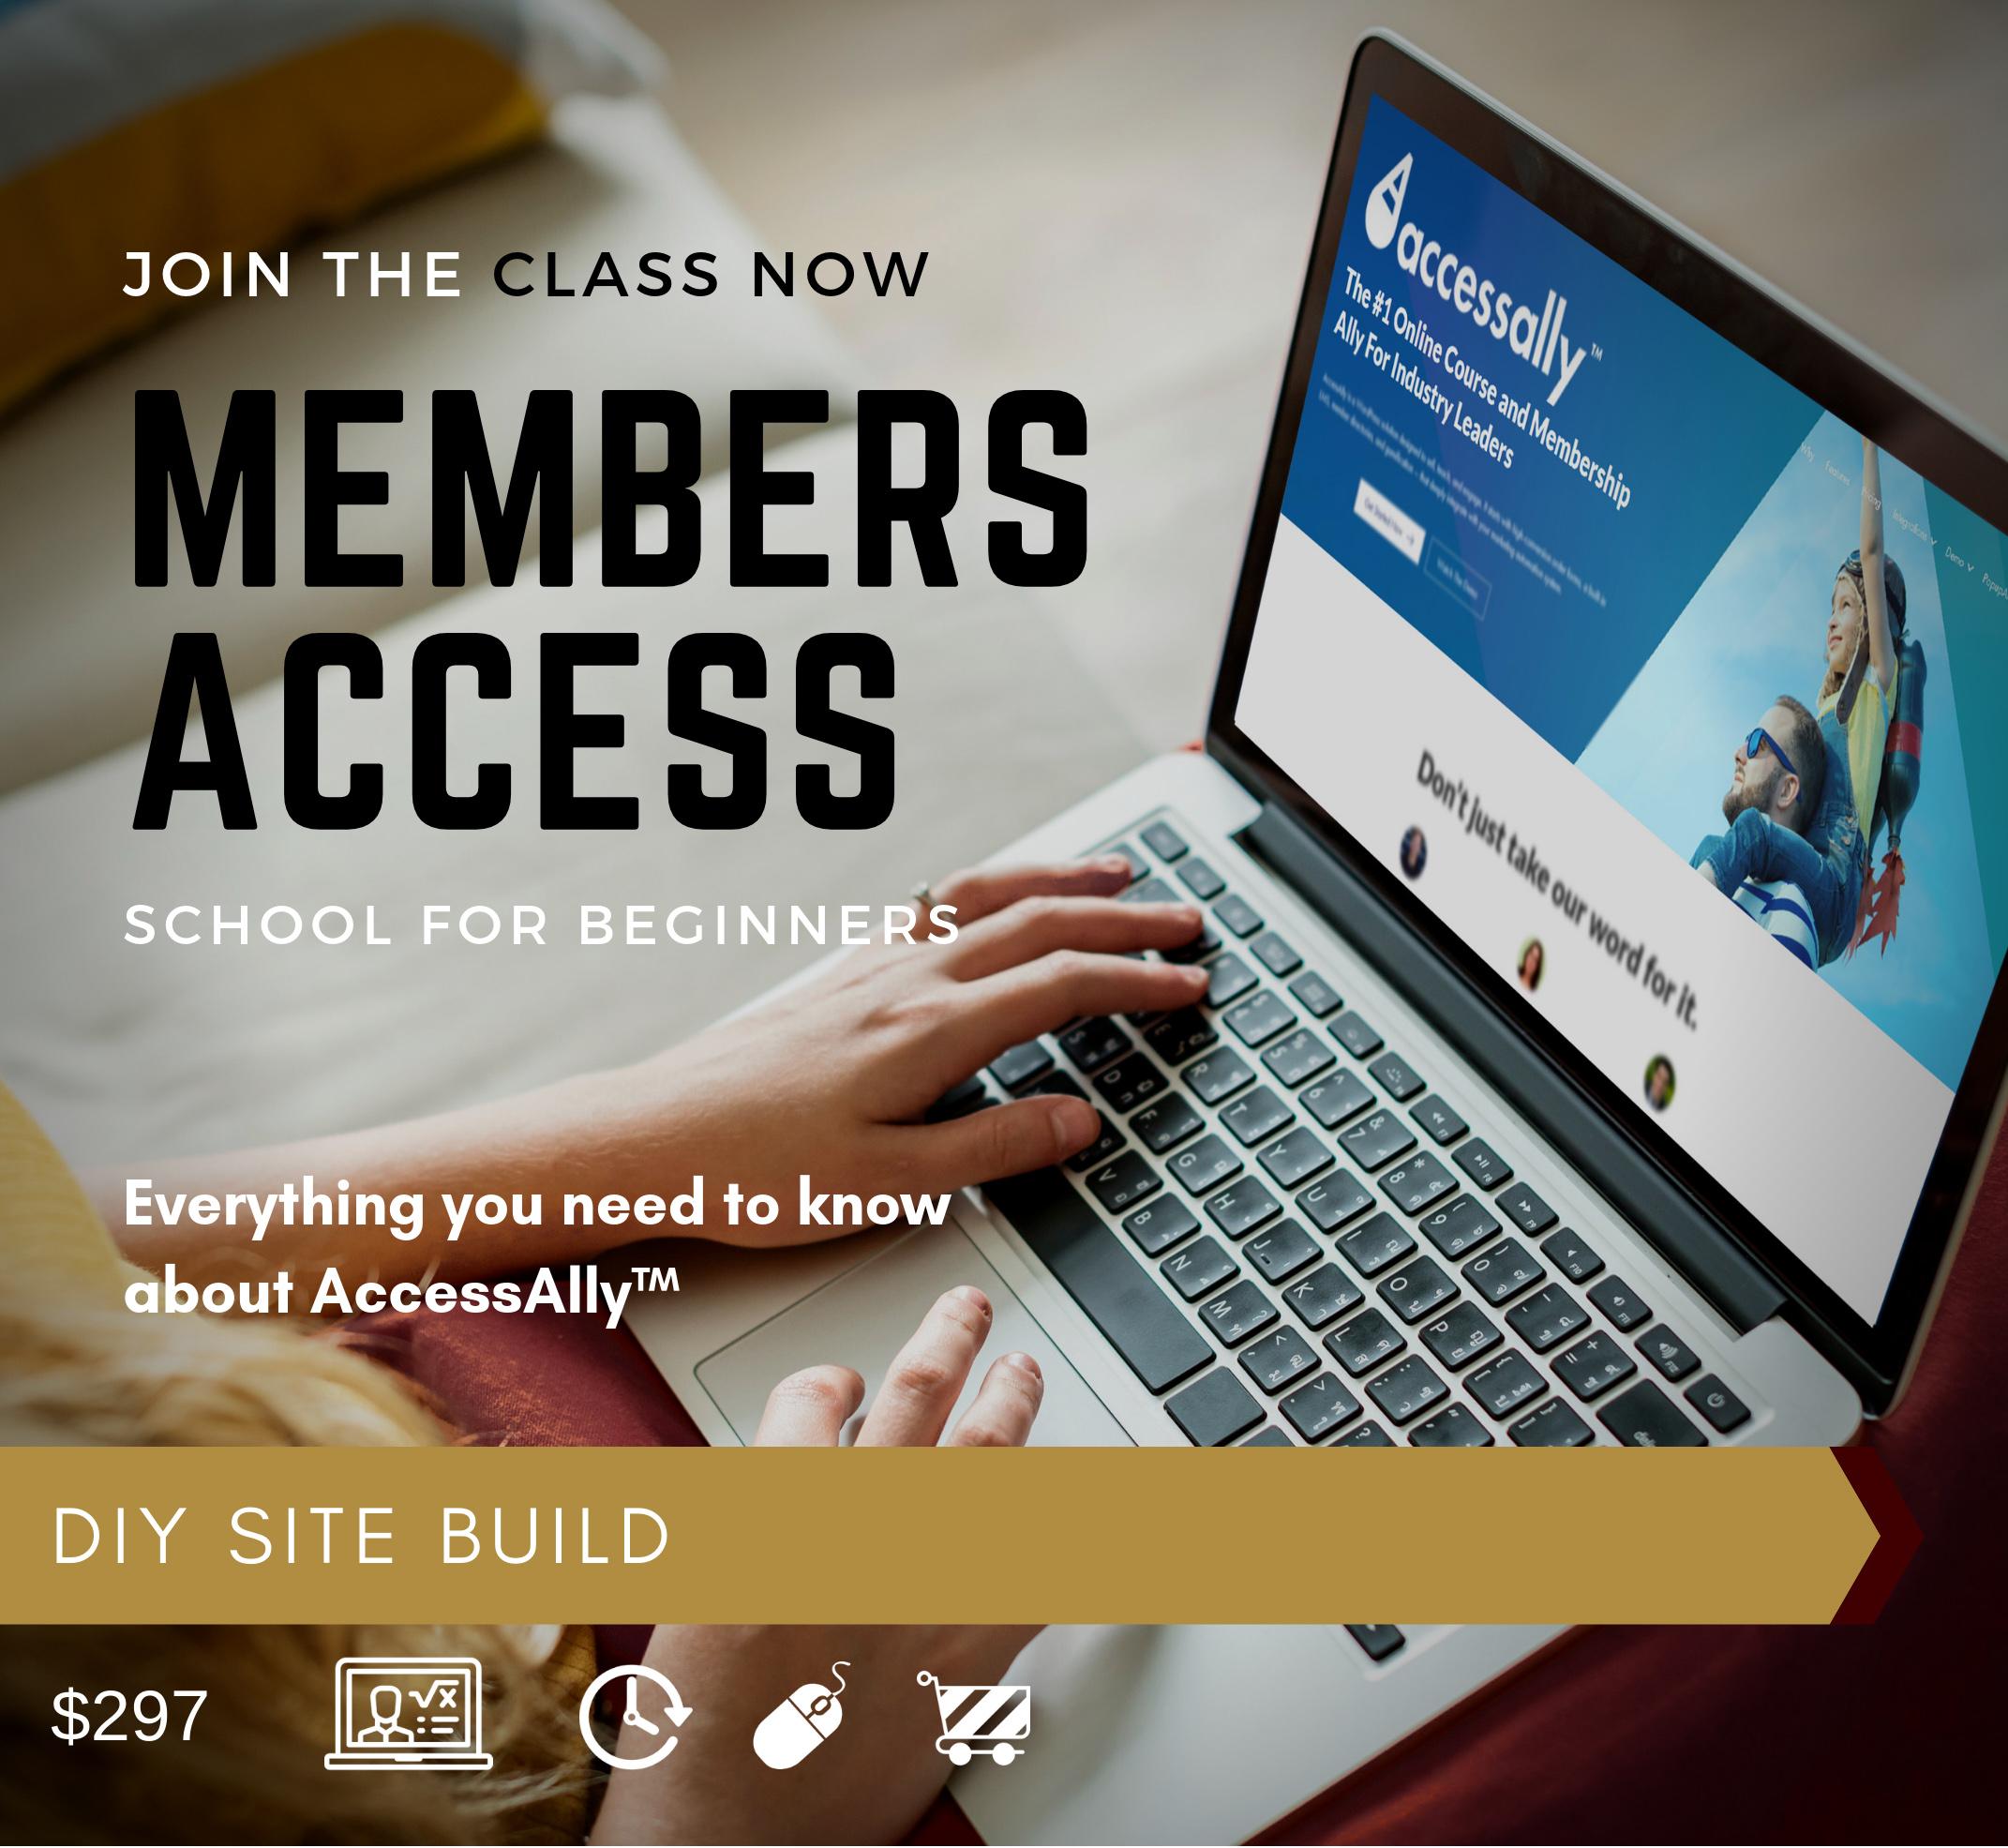 Members Access School